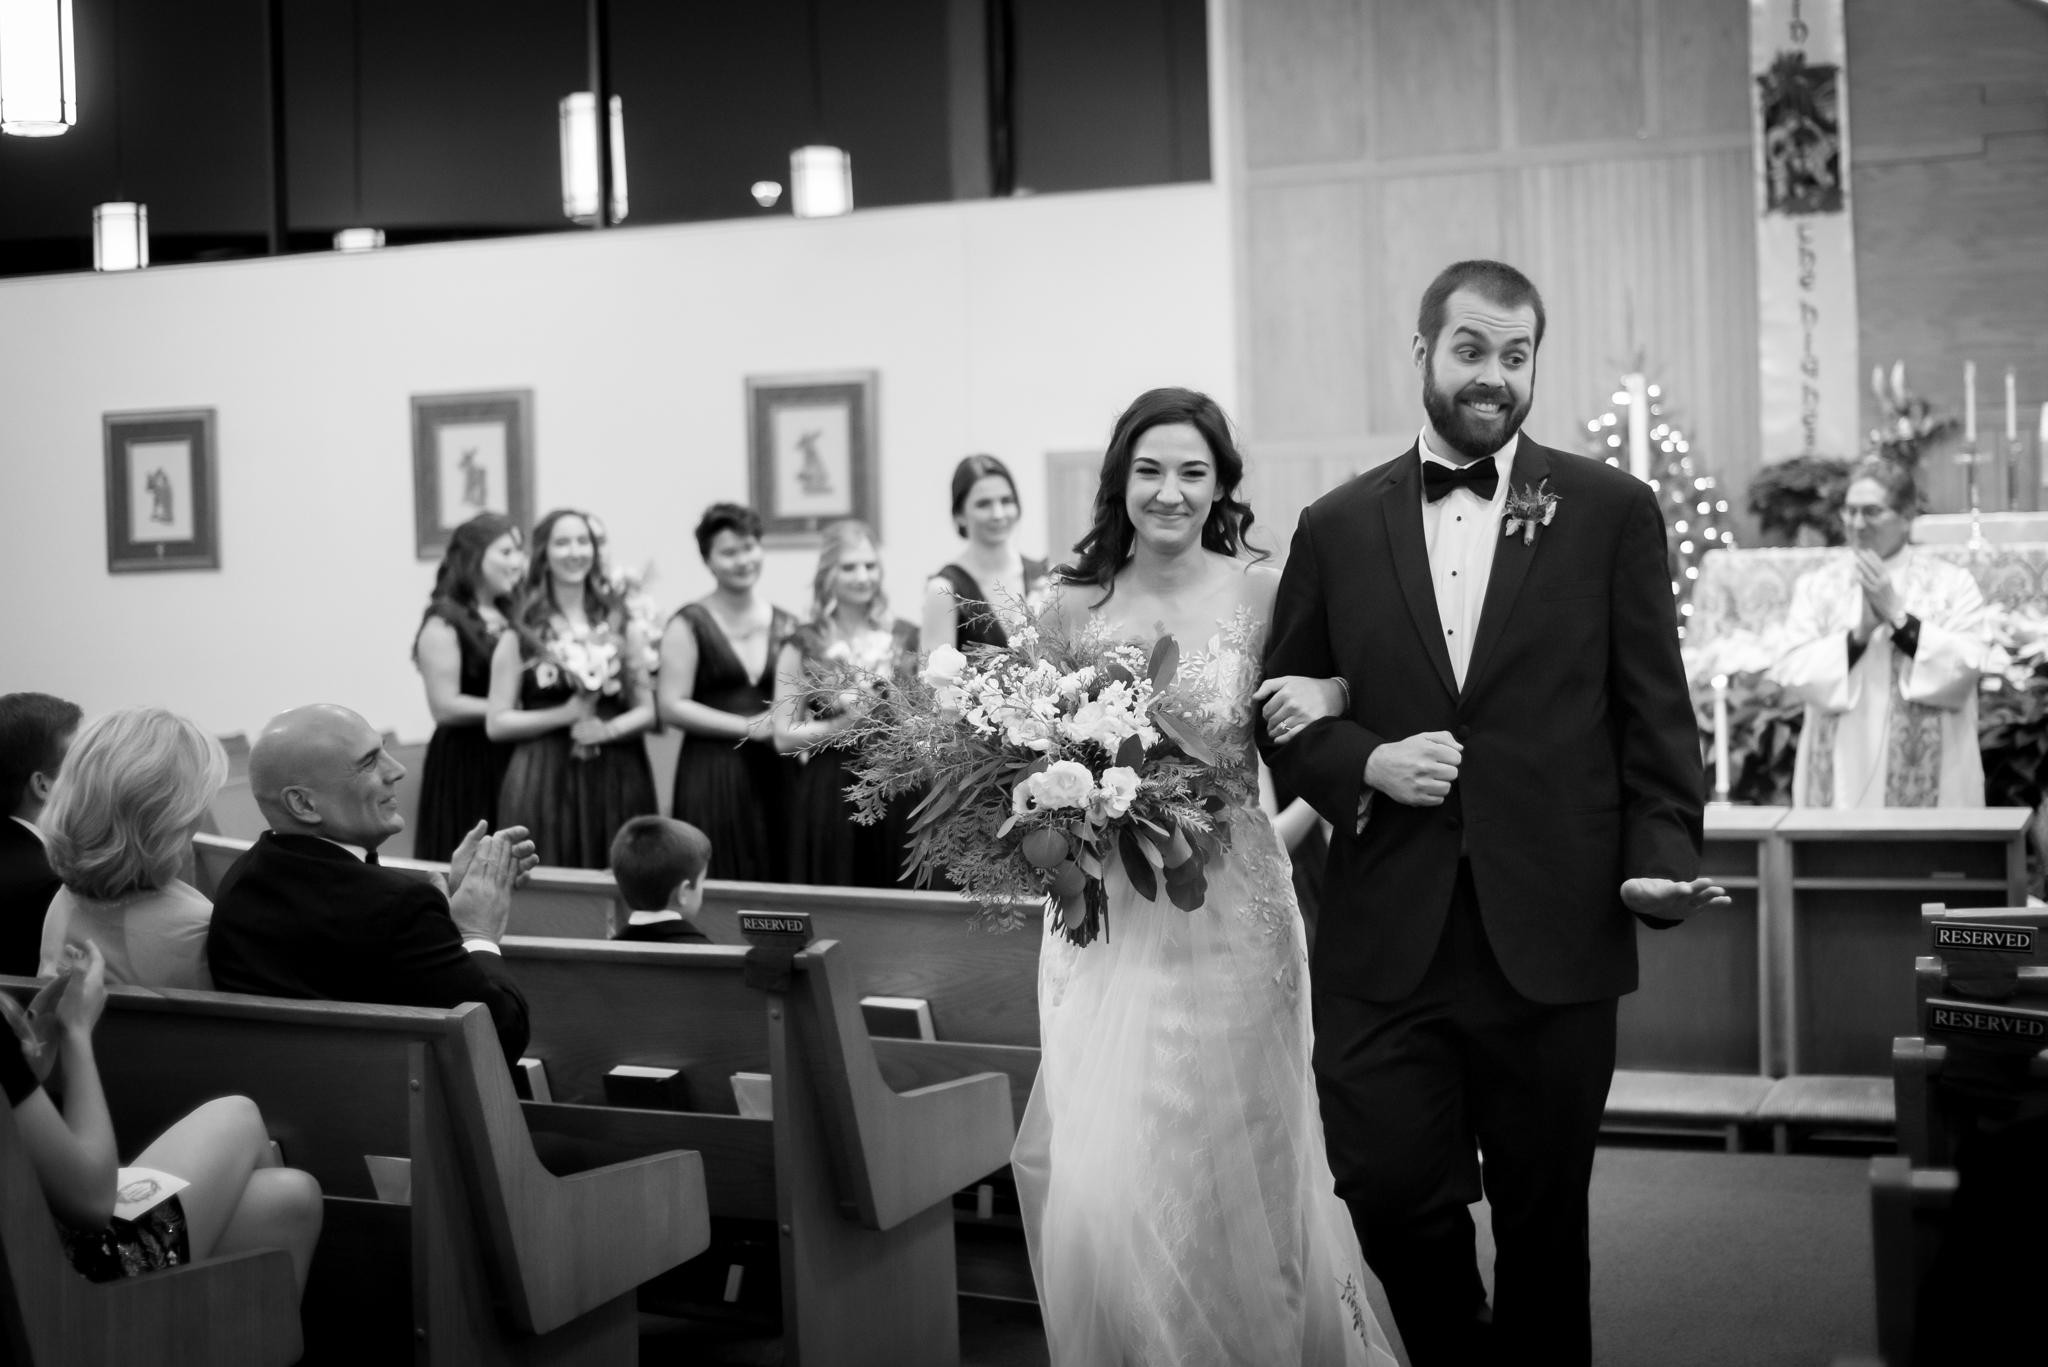 merrimon-wynne-wedding-photography-034.jpg